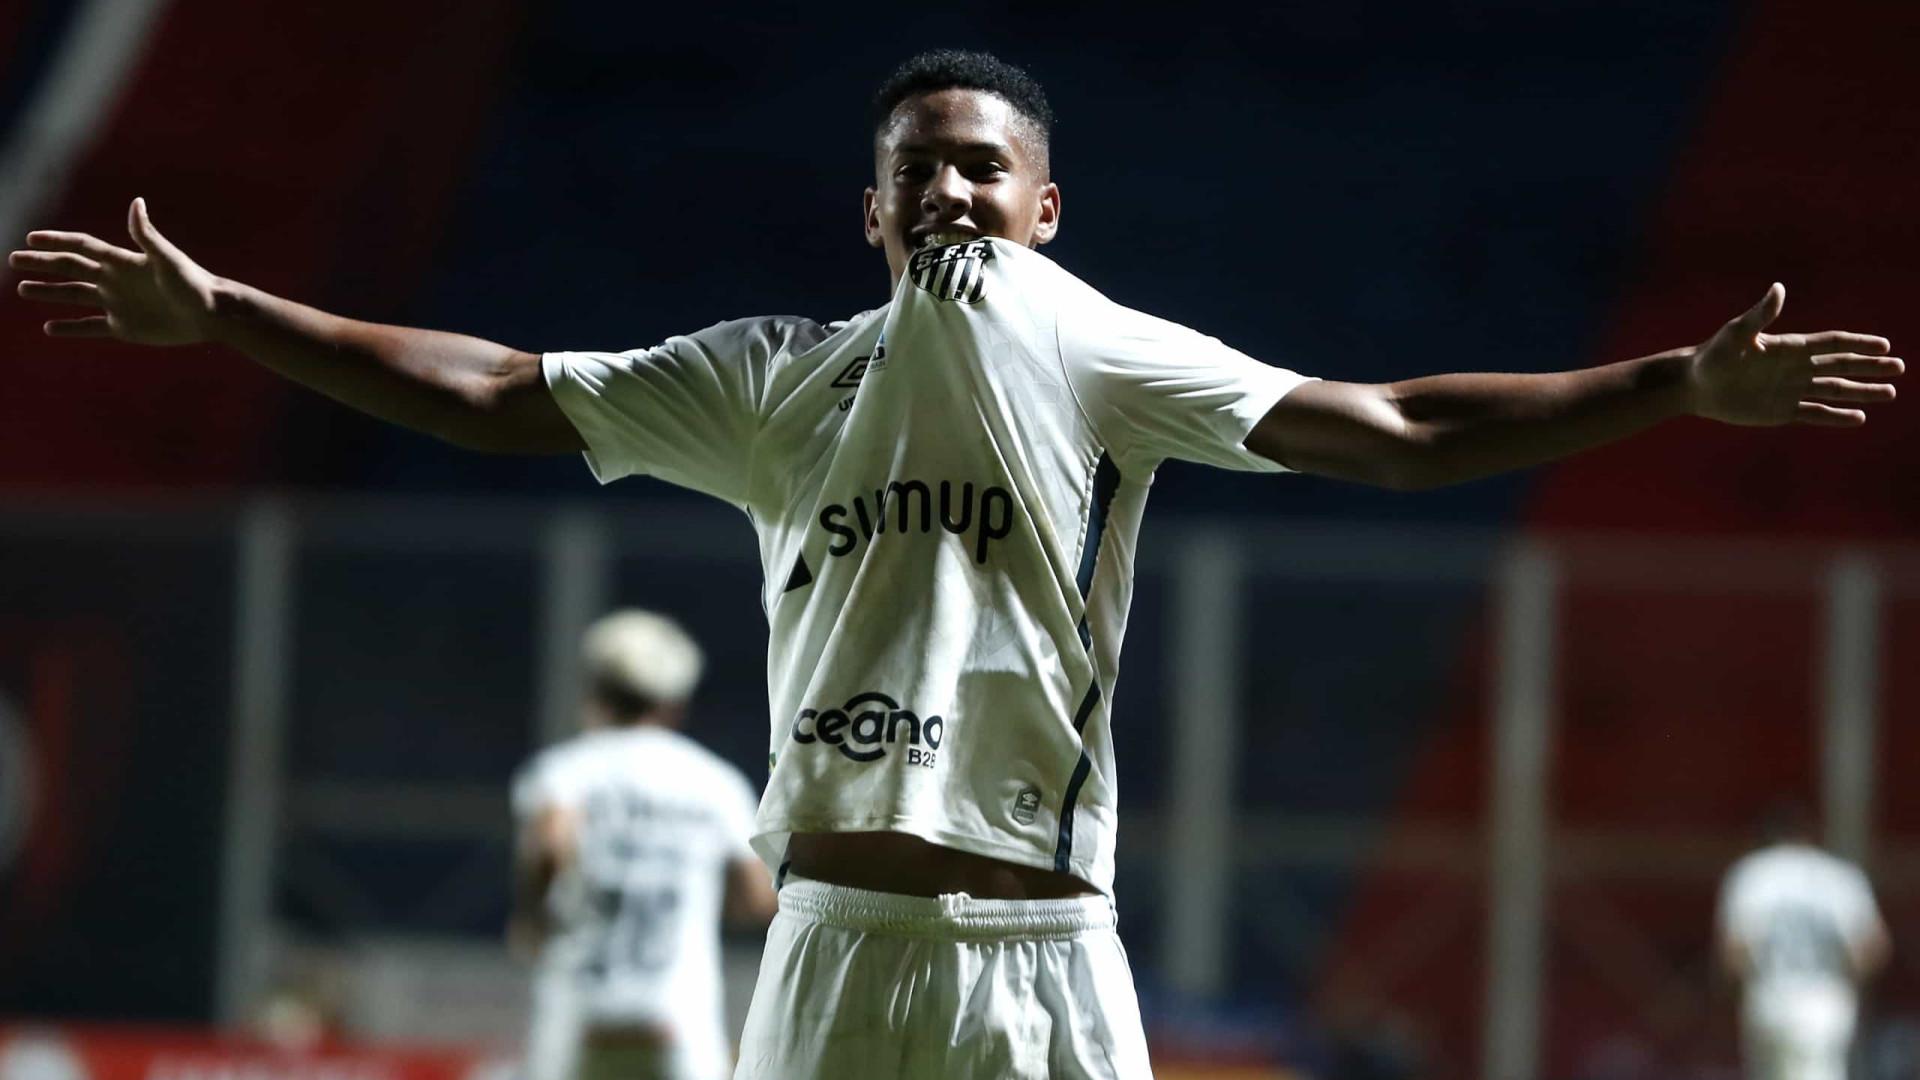 Santos vence na Argentina e fica perto da fase de grupos da Libertadores